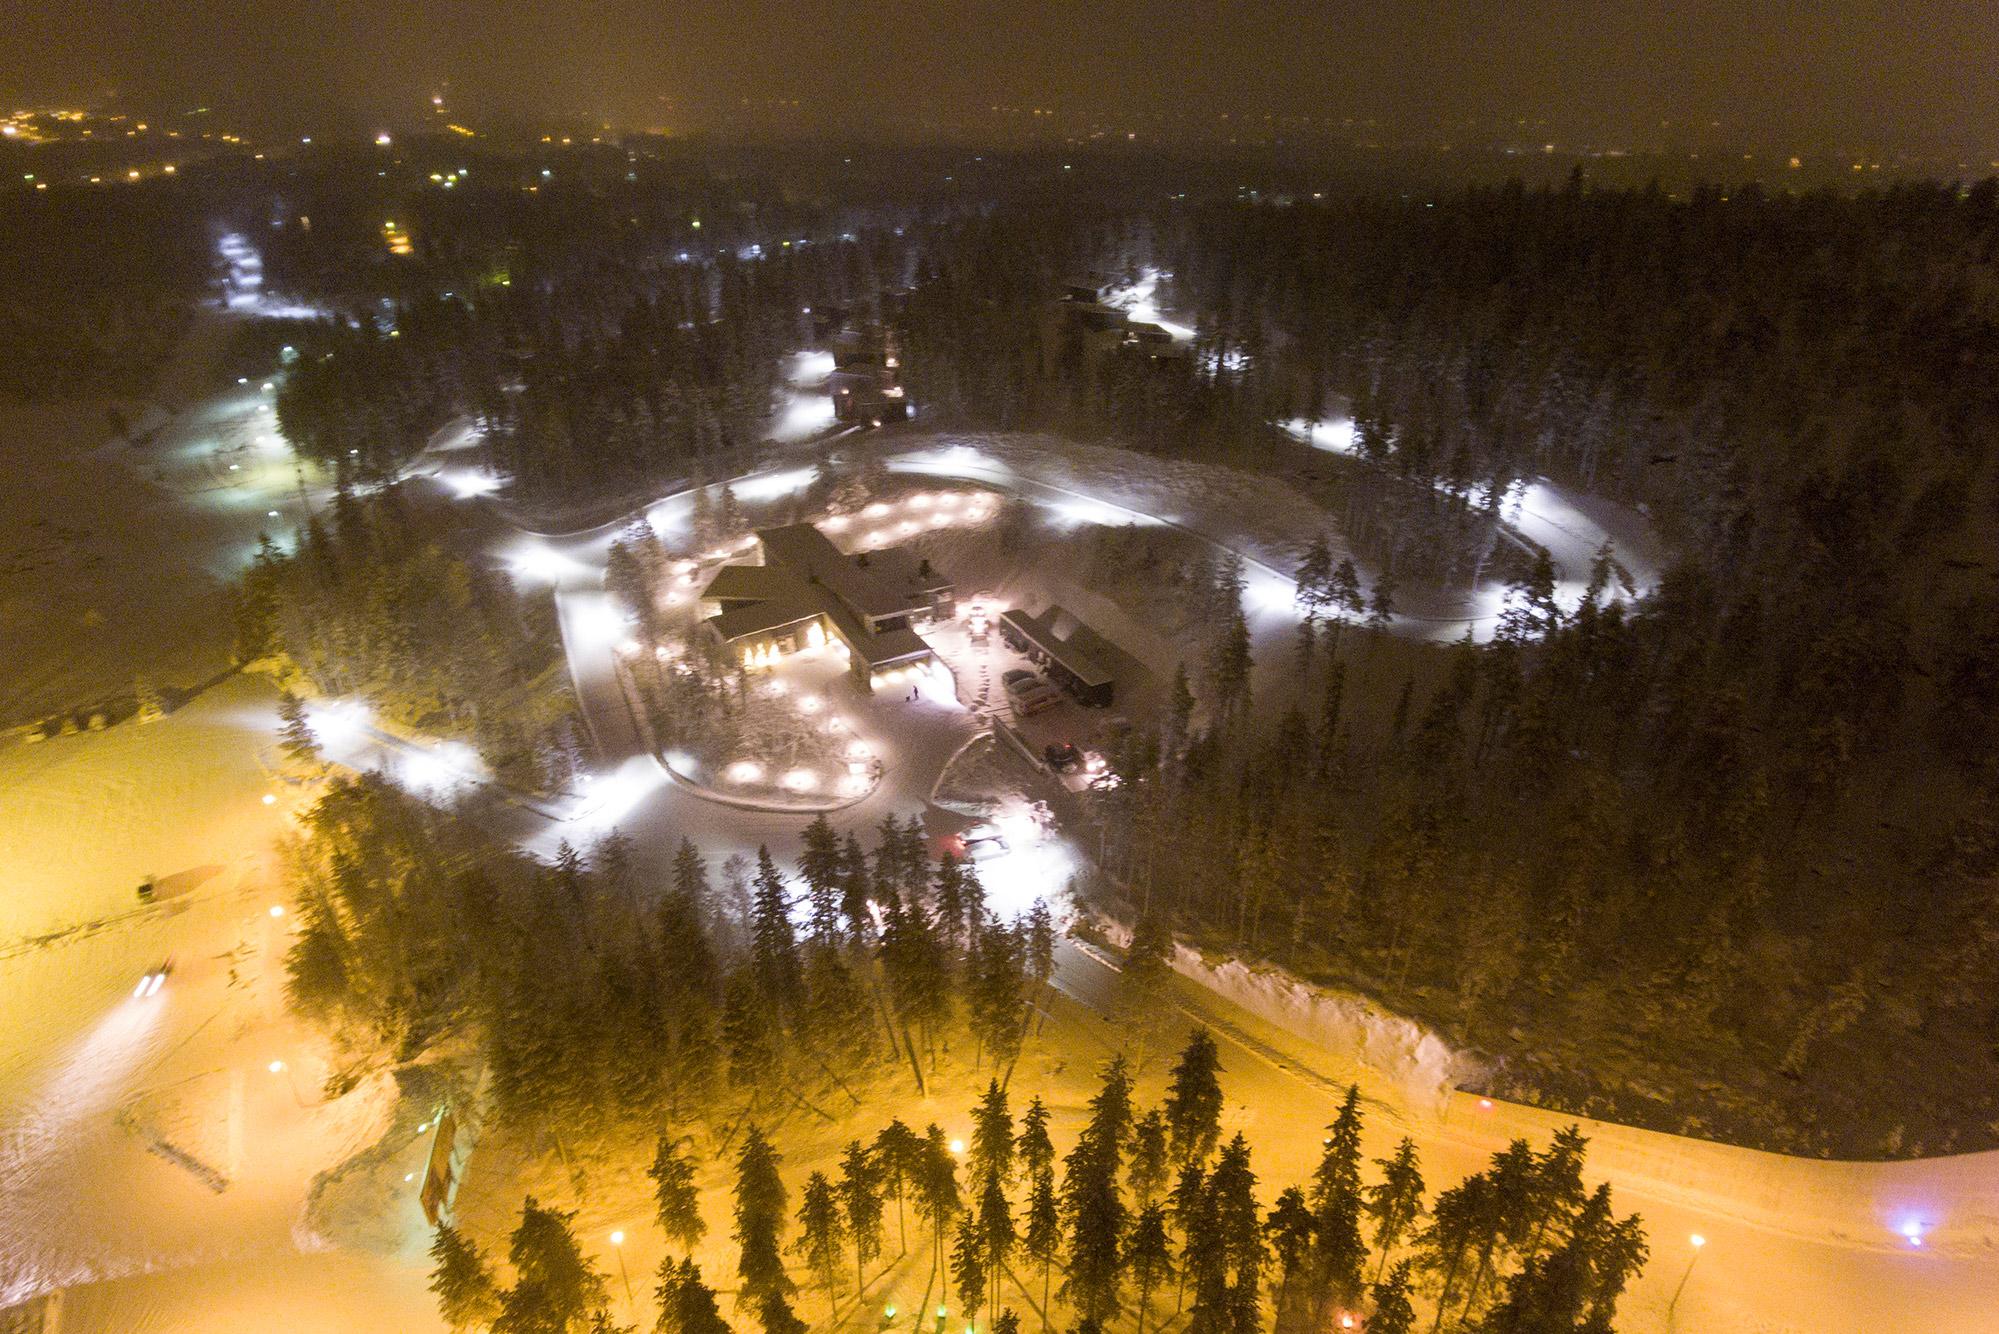 Arctic TreeHouse Hotel Location